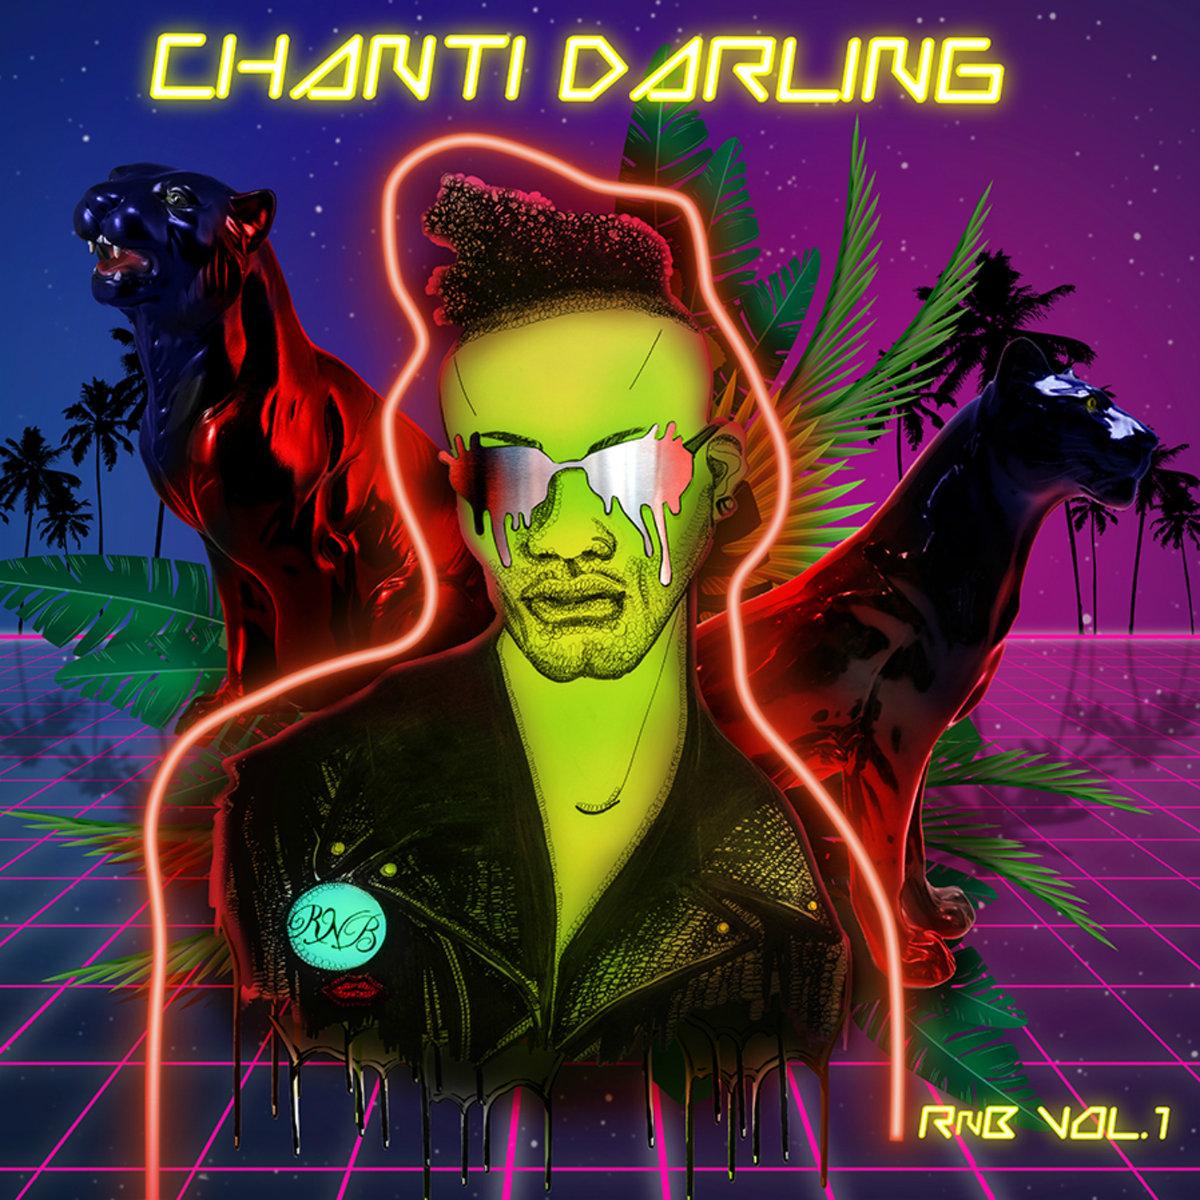 Chanti Darling - RNB VOL.1 - Mixing